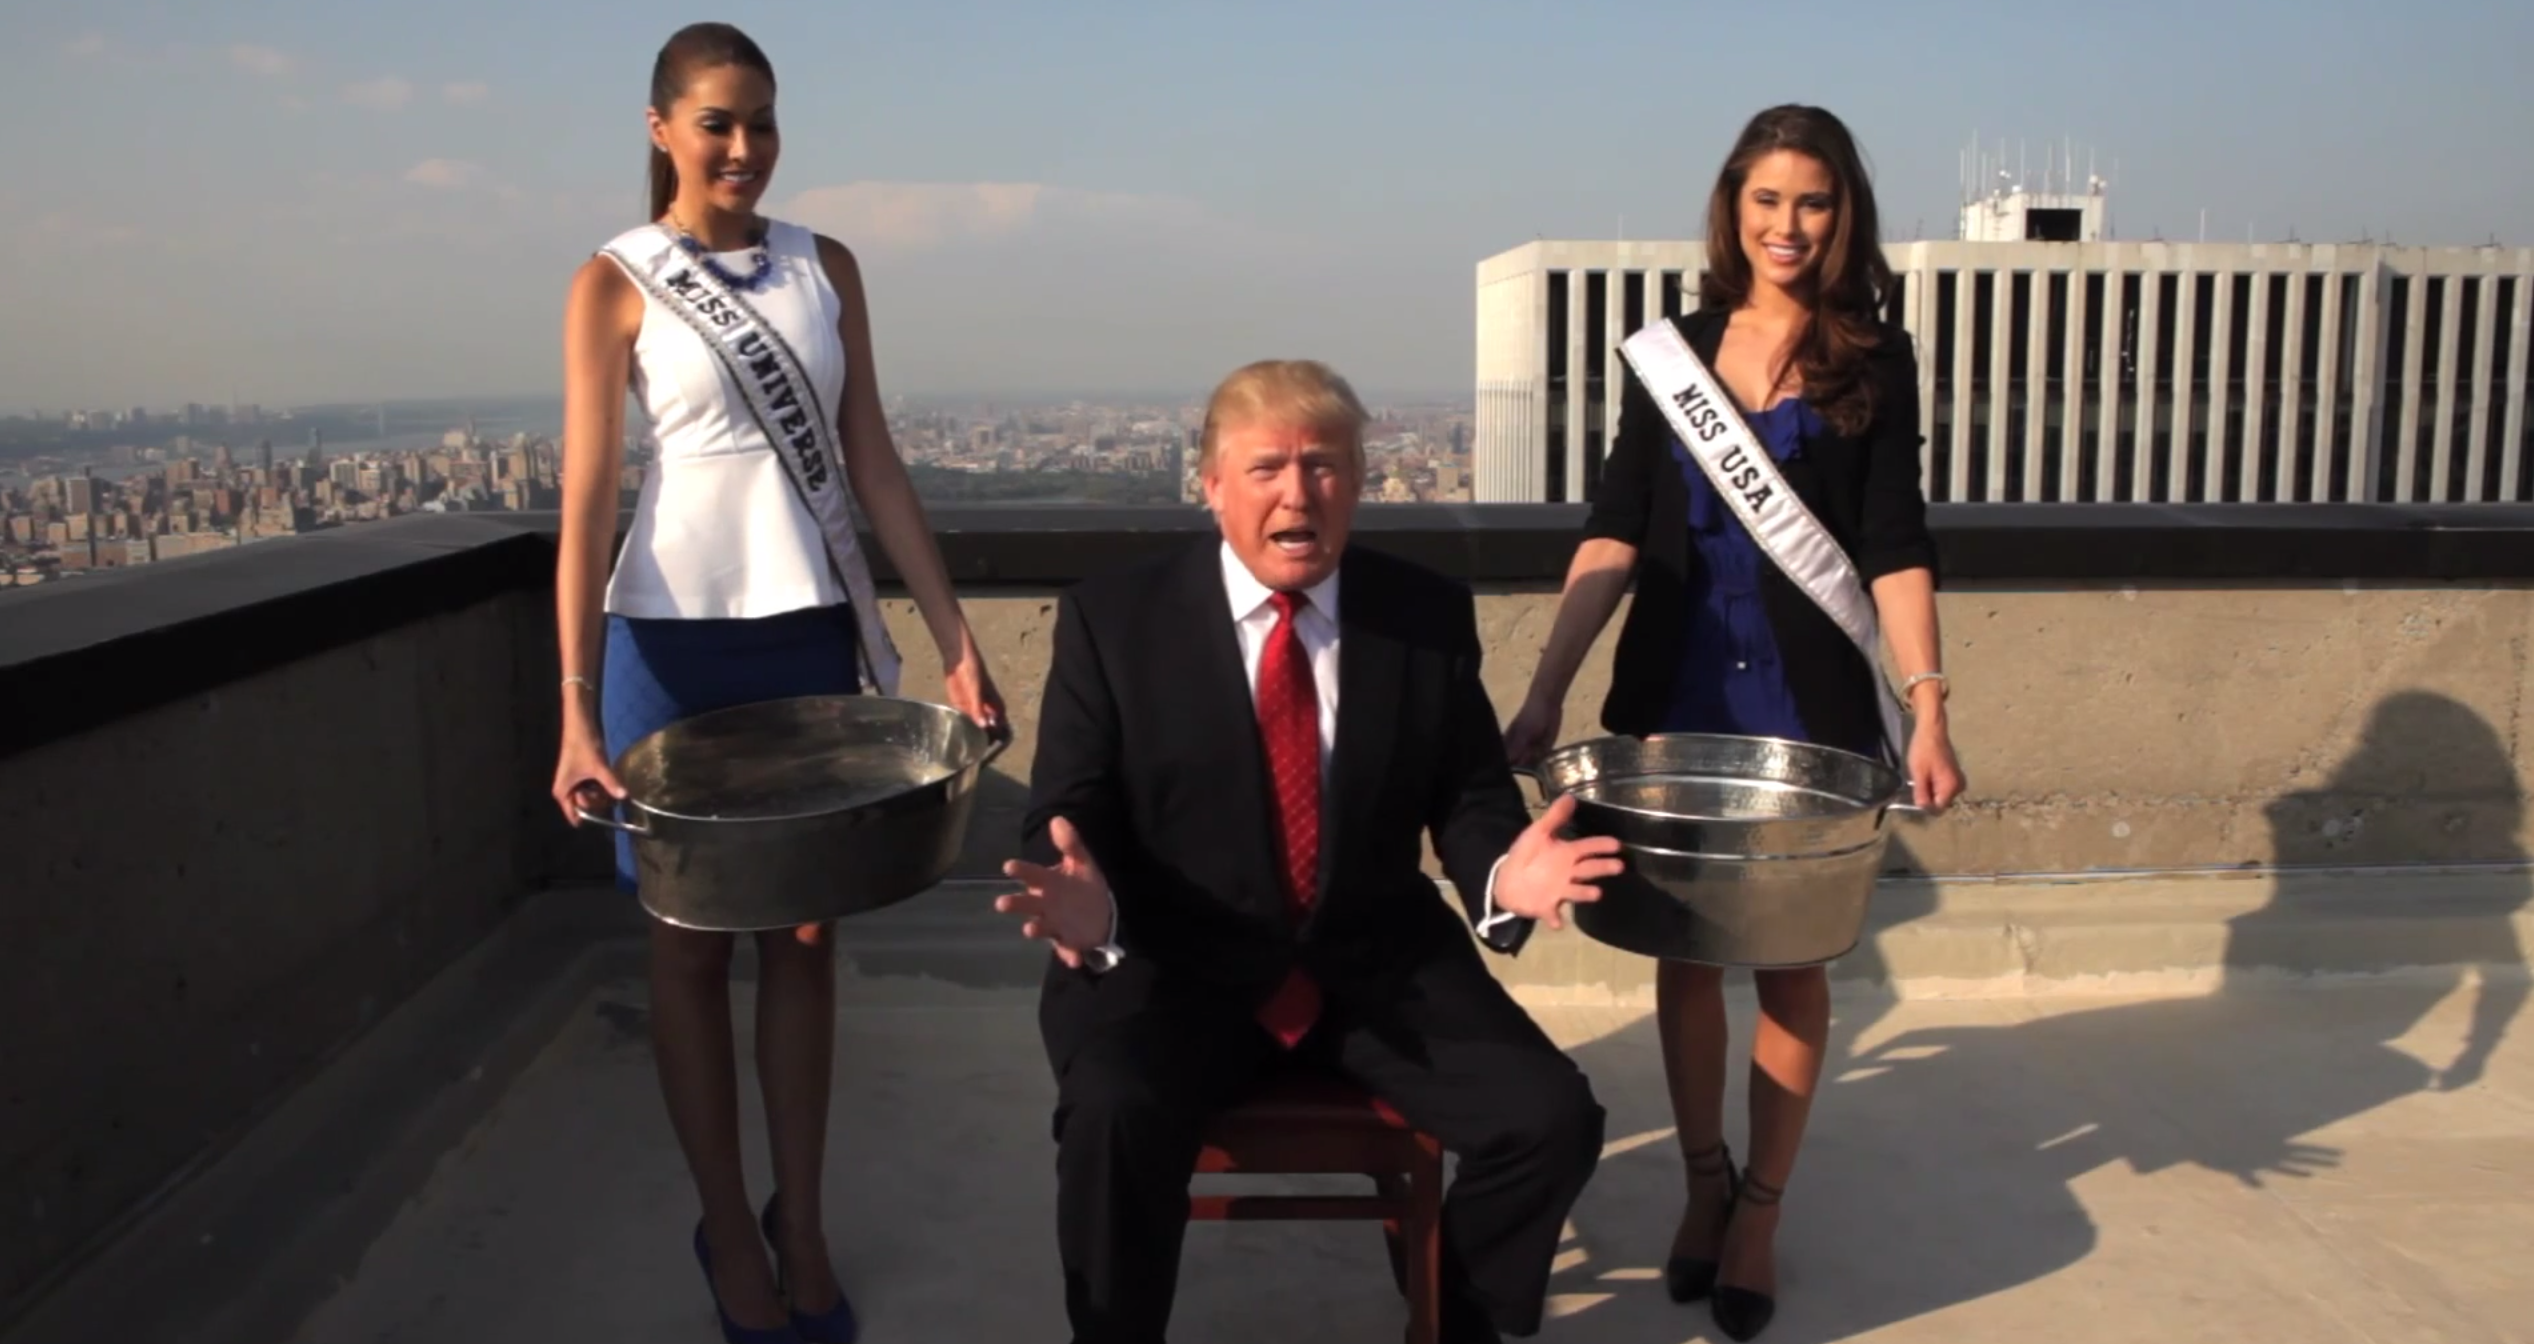 Donald Trump takes the ice bucket challenge